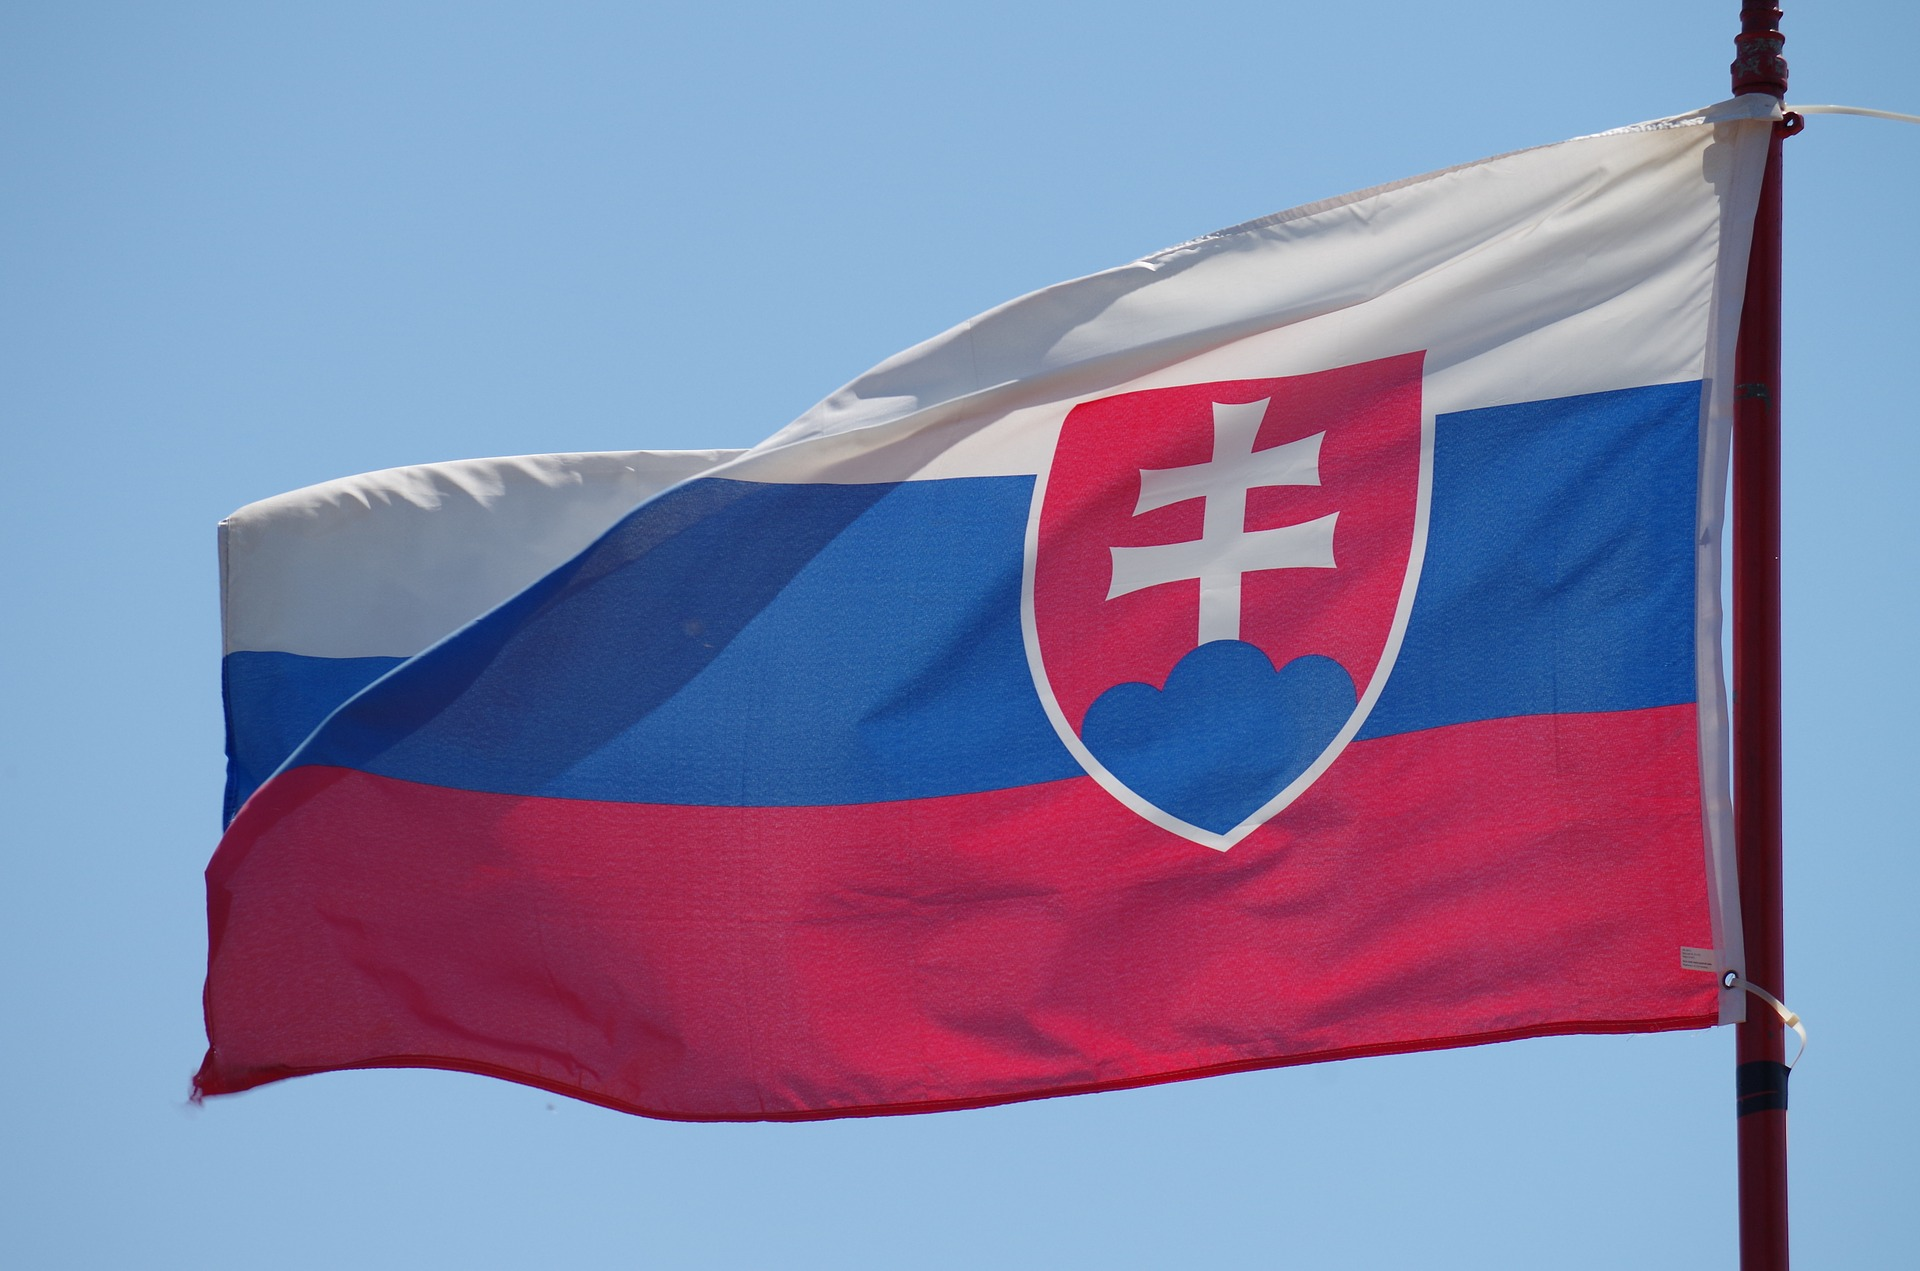 Slowakische Nationalmannschaft